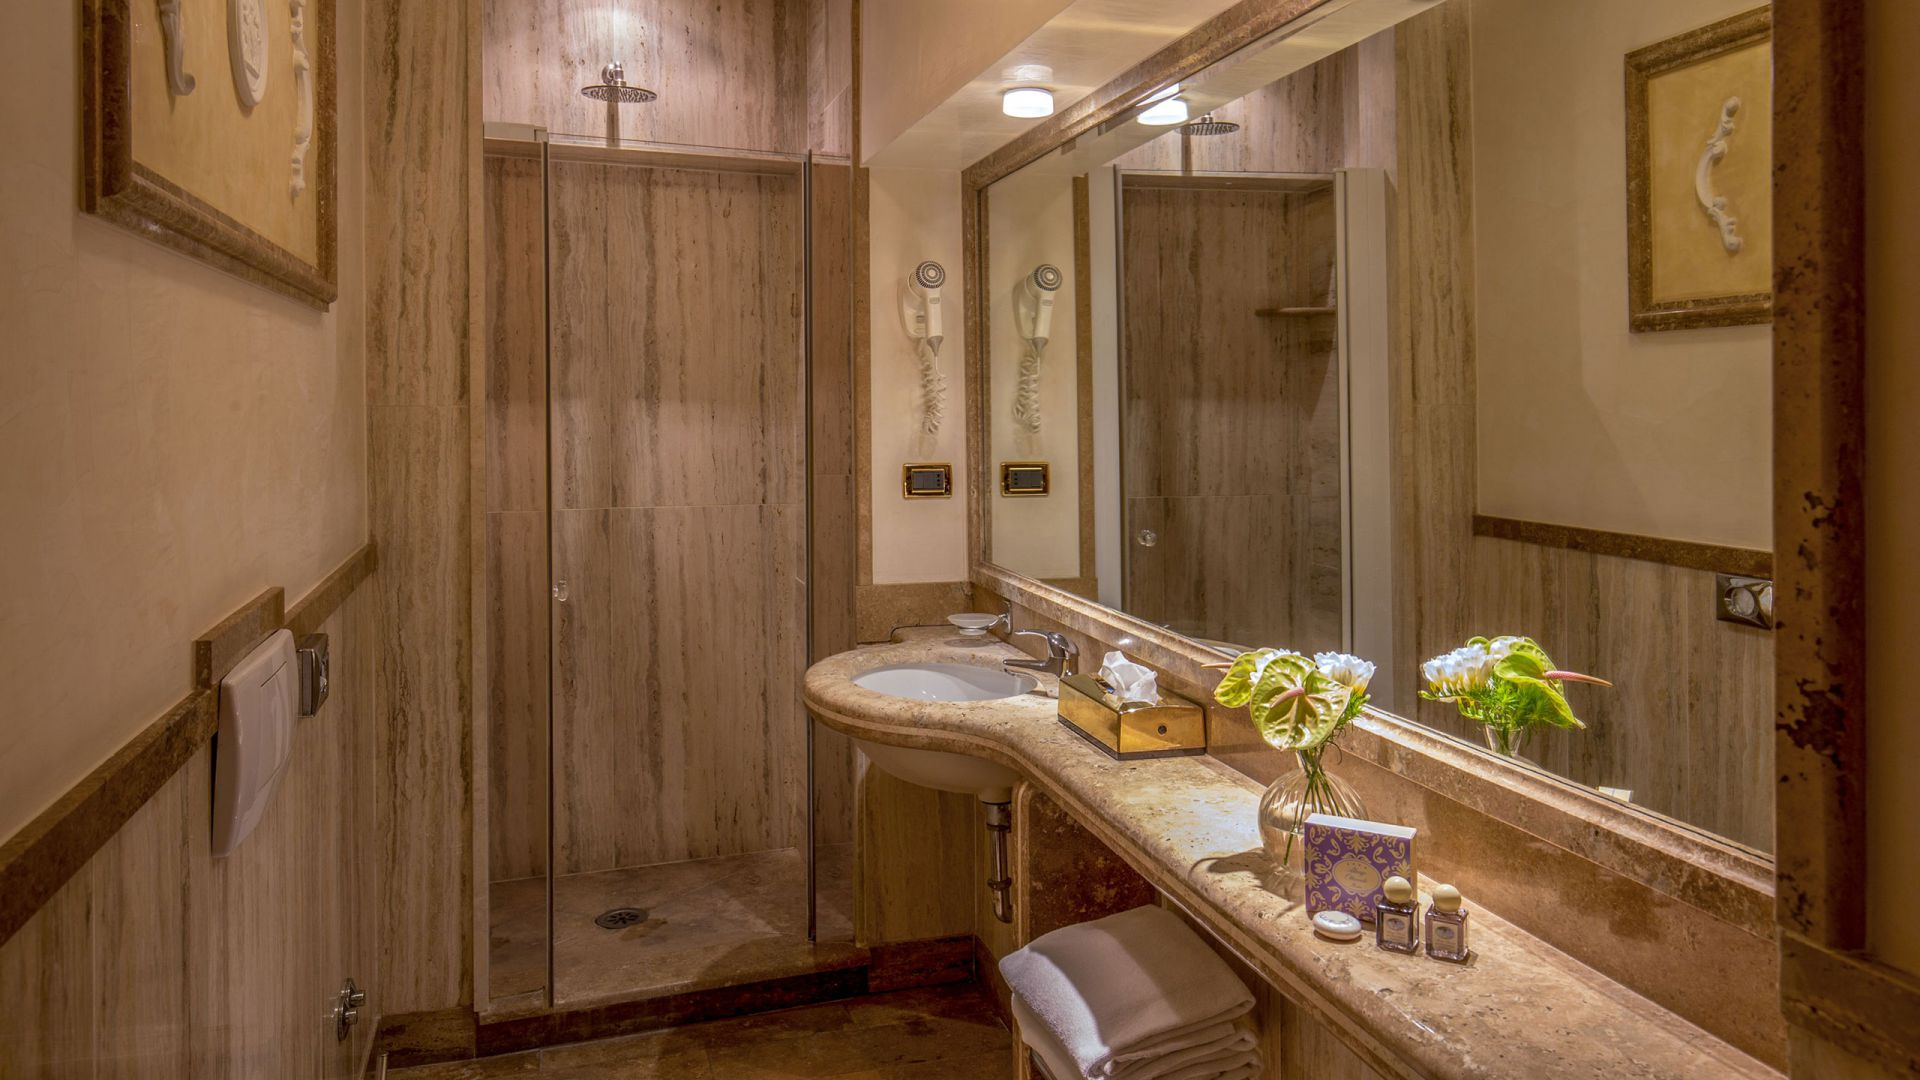 albergo-ottocento-rome-salle-de-bain-16